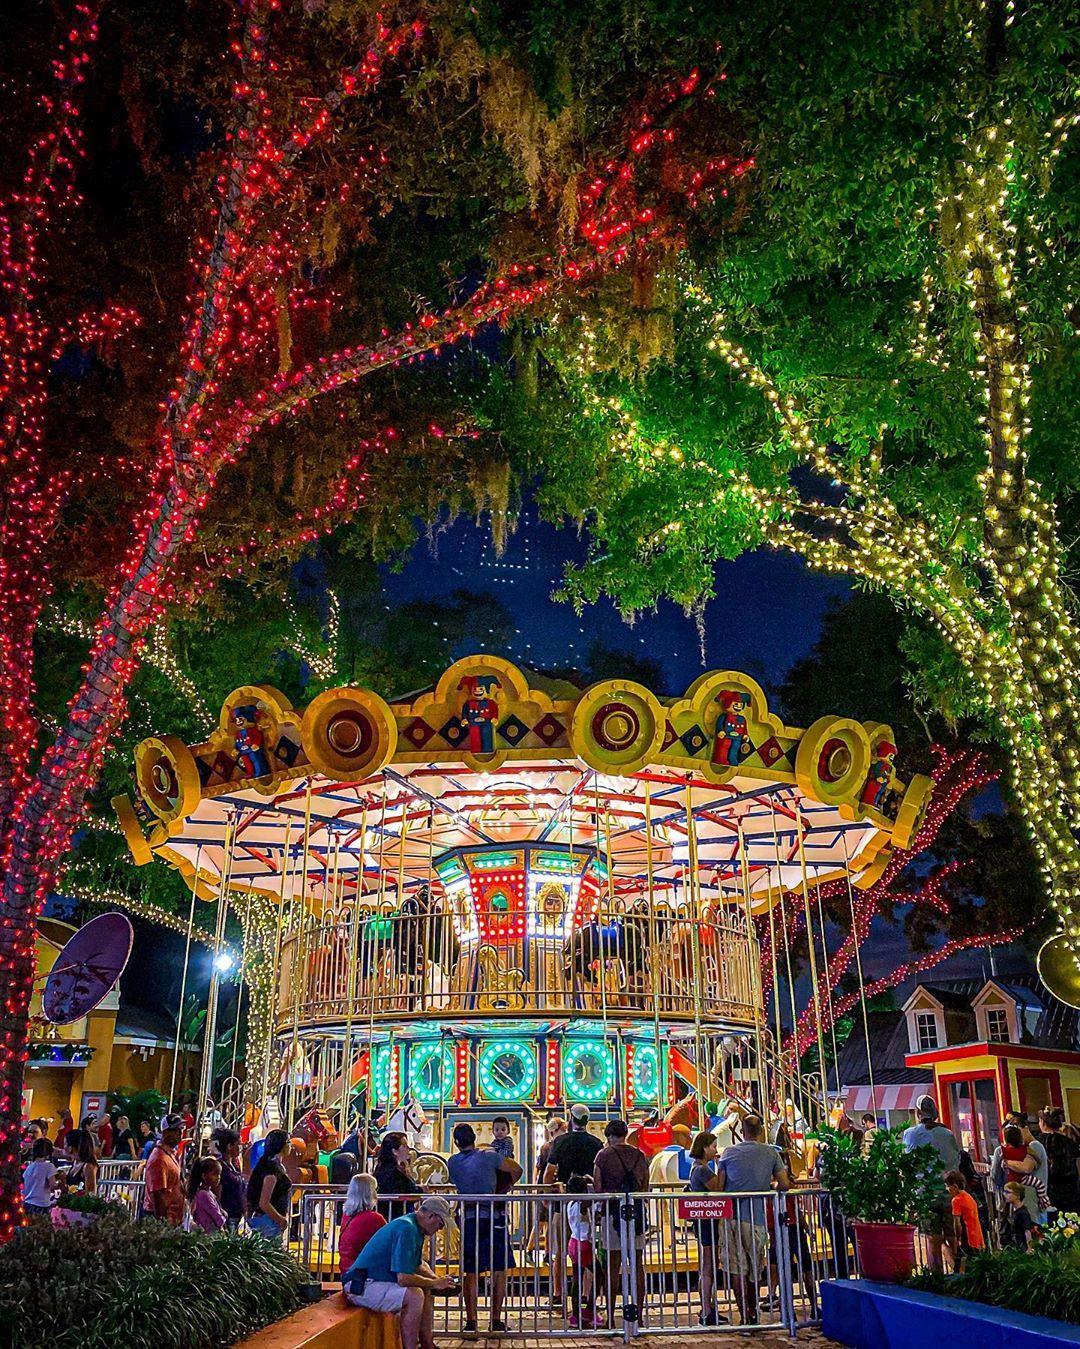 Rockin Around The Carrousel Legolandflorida Katrindel Legoland Florida Florida Resorts Theme Parks Rides